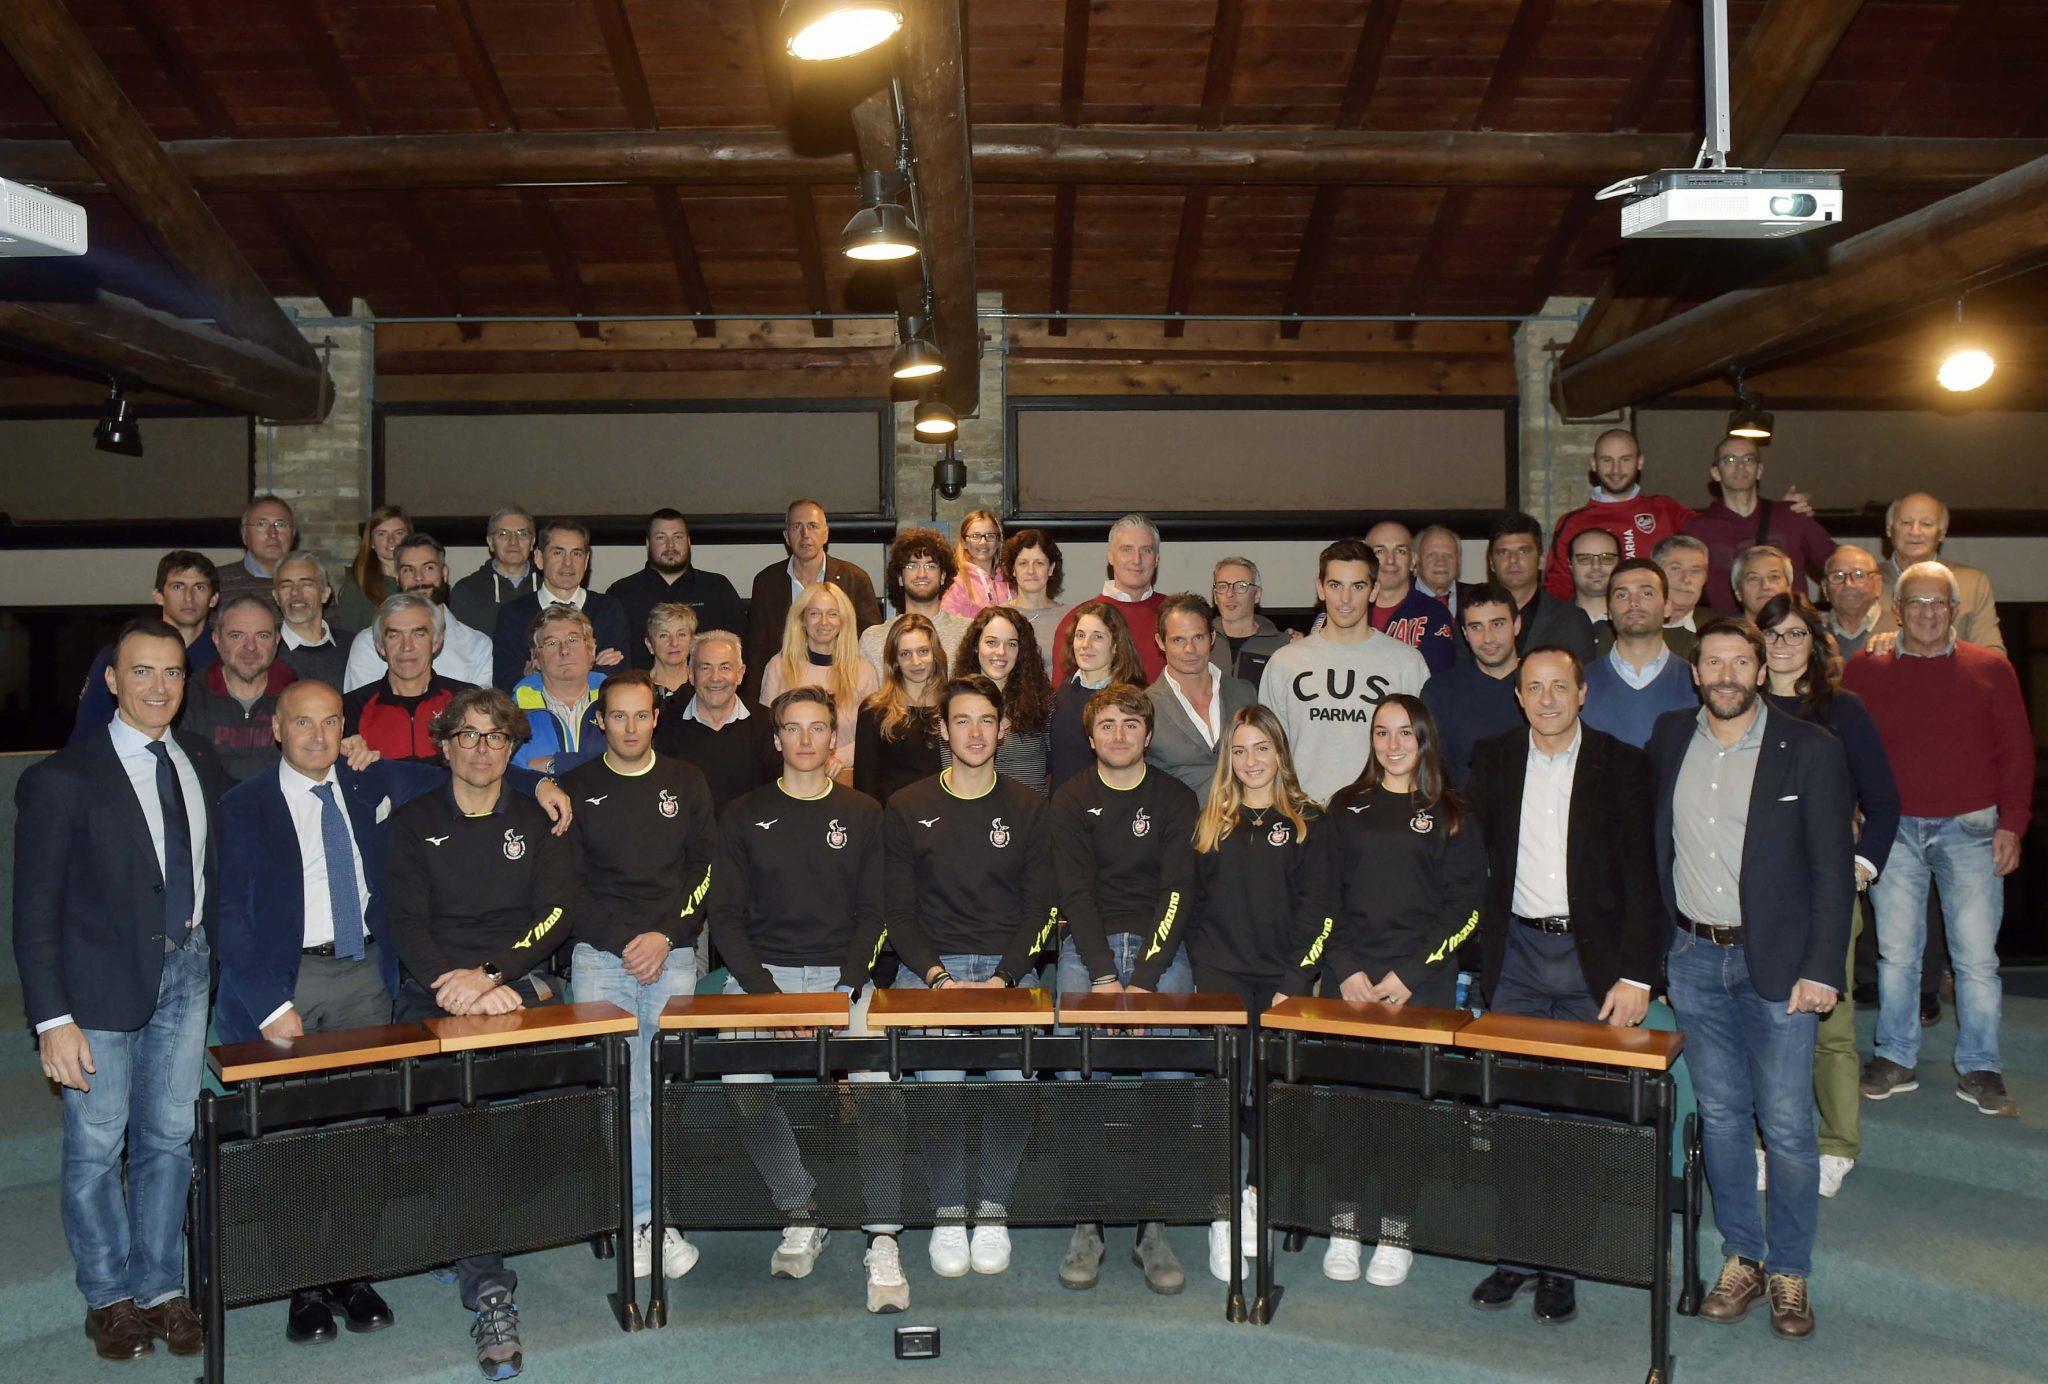 Sport invernali, Cus Parma Asd punta sui giovani – CUS Parma